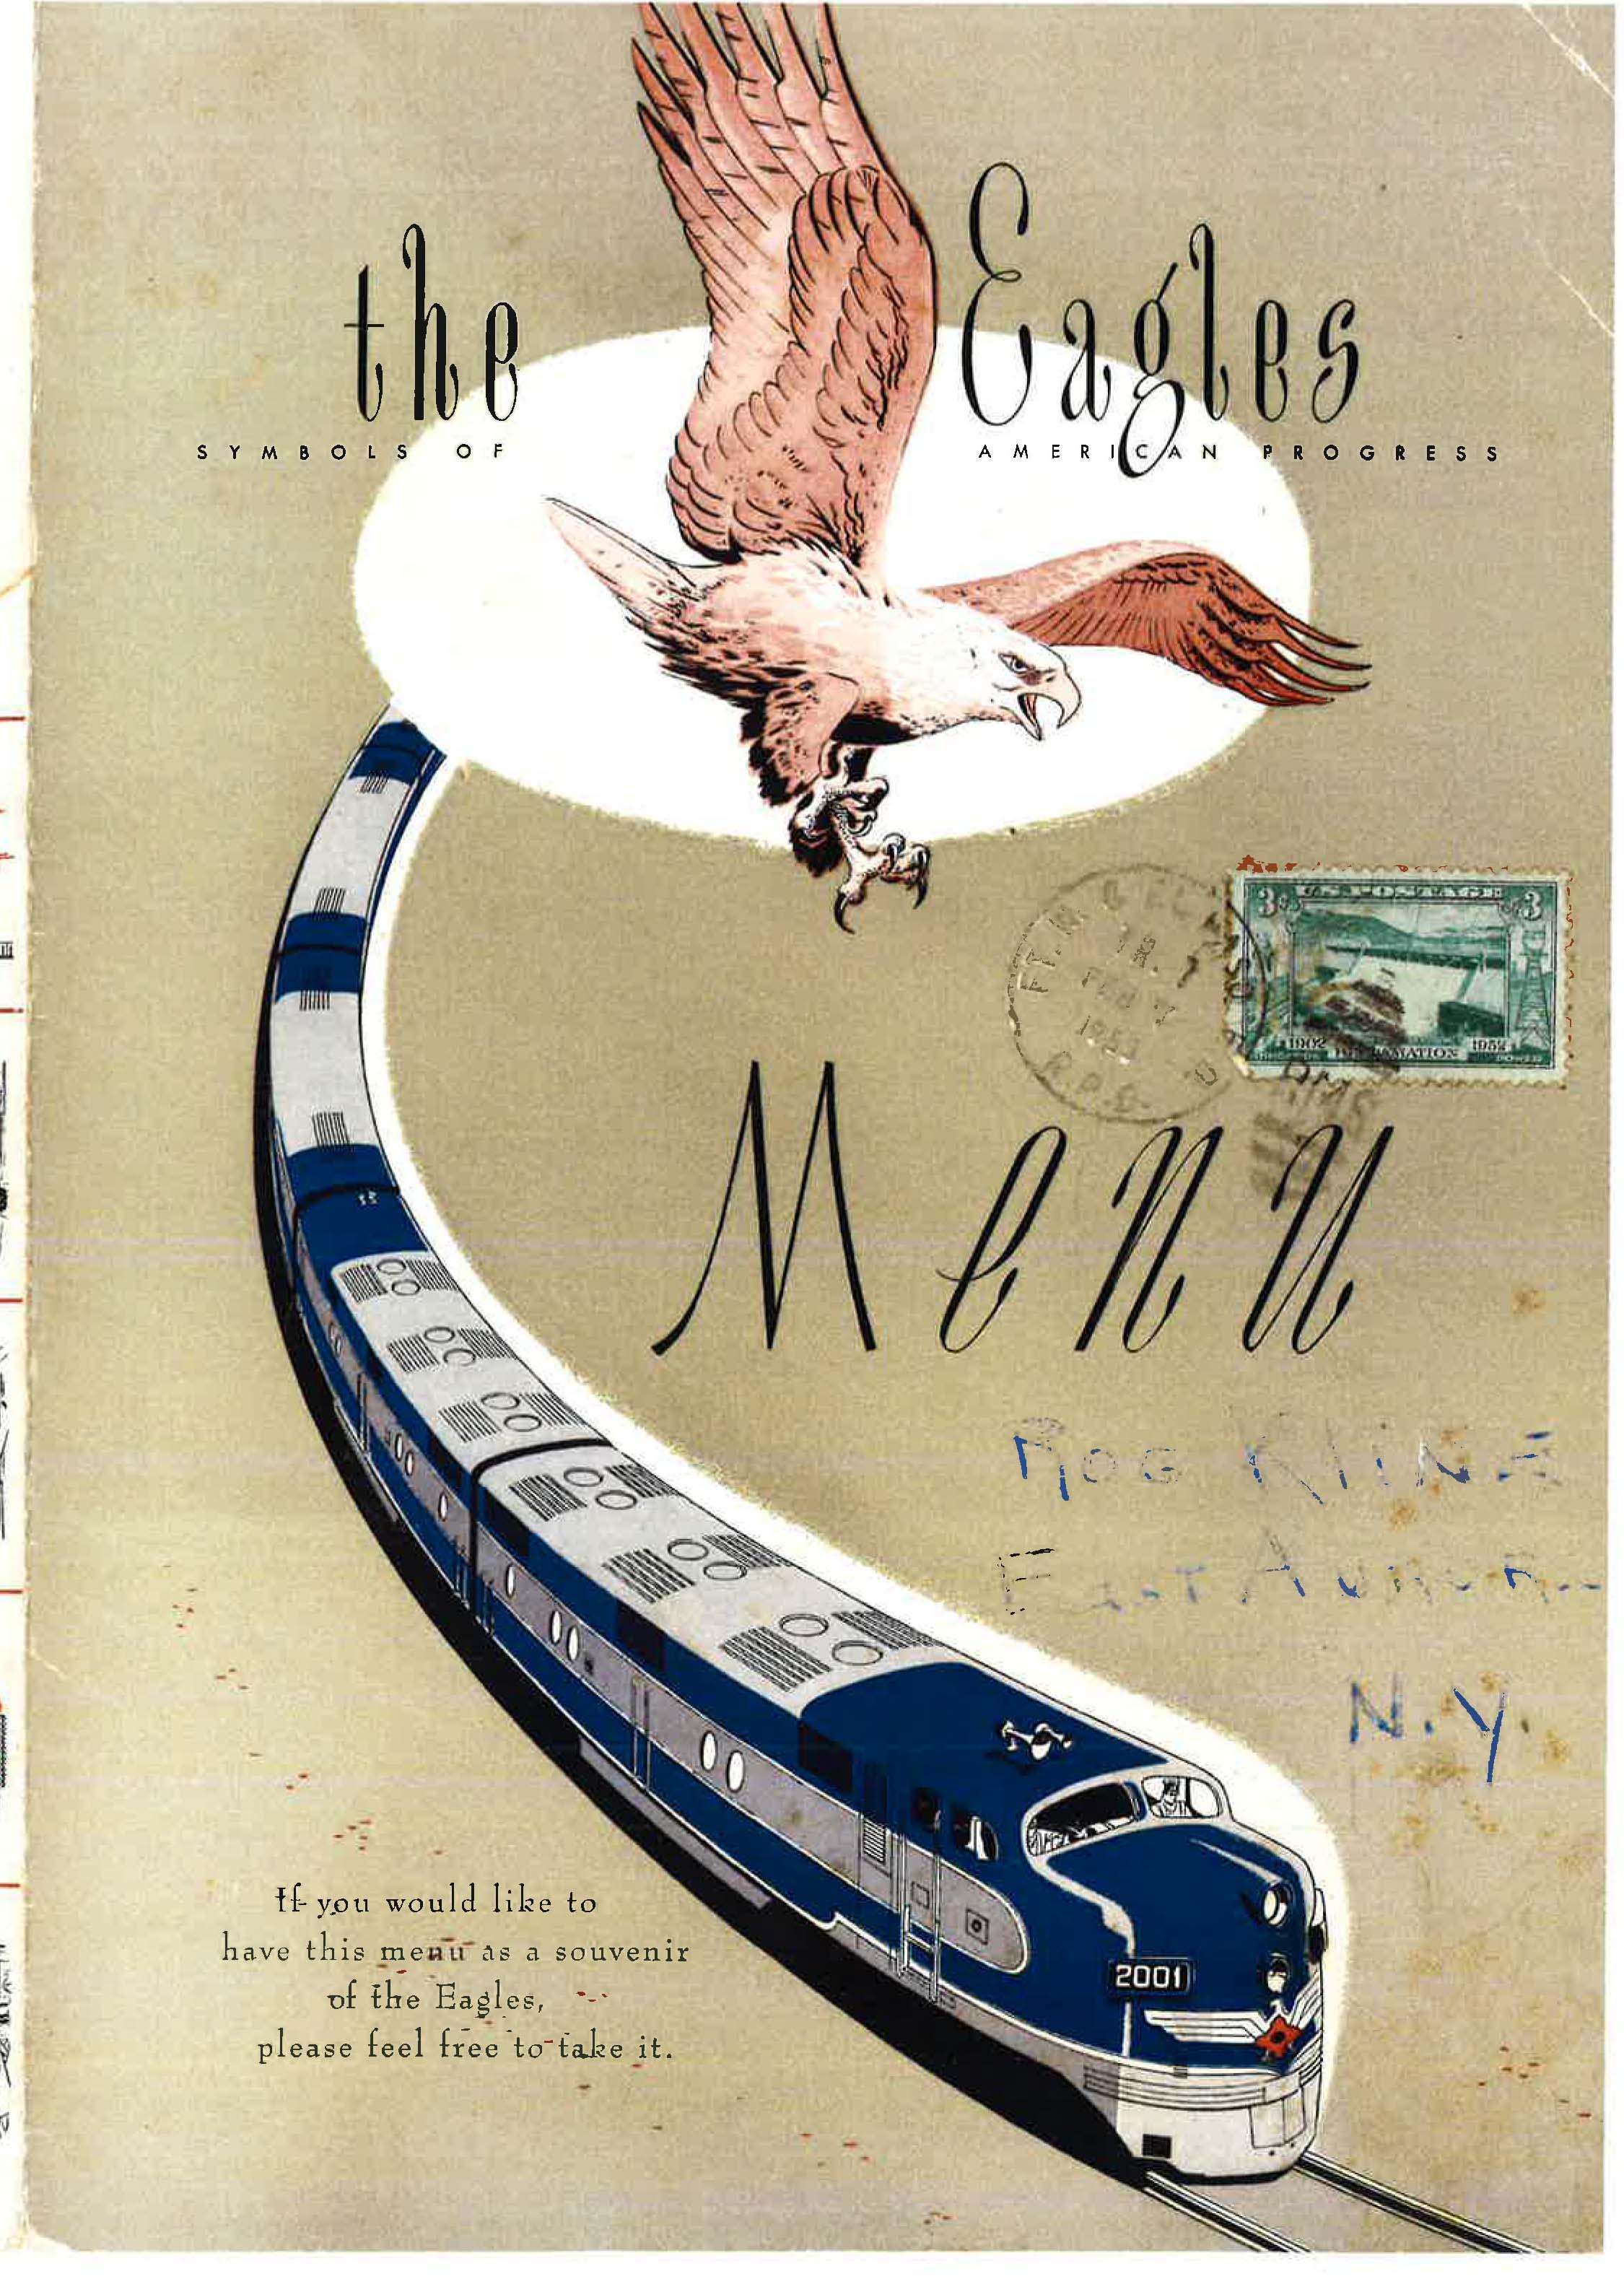 Texas+And+Pacific+Railway+the+Eagles+Breakfast+Menu 1a.jpg